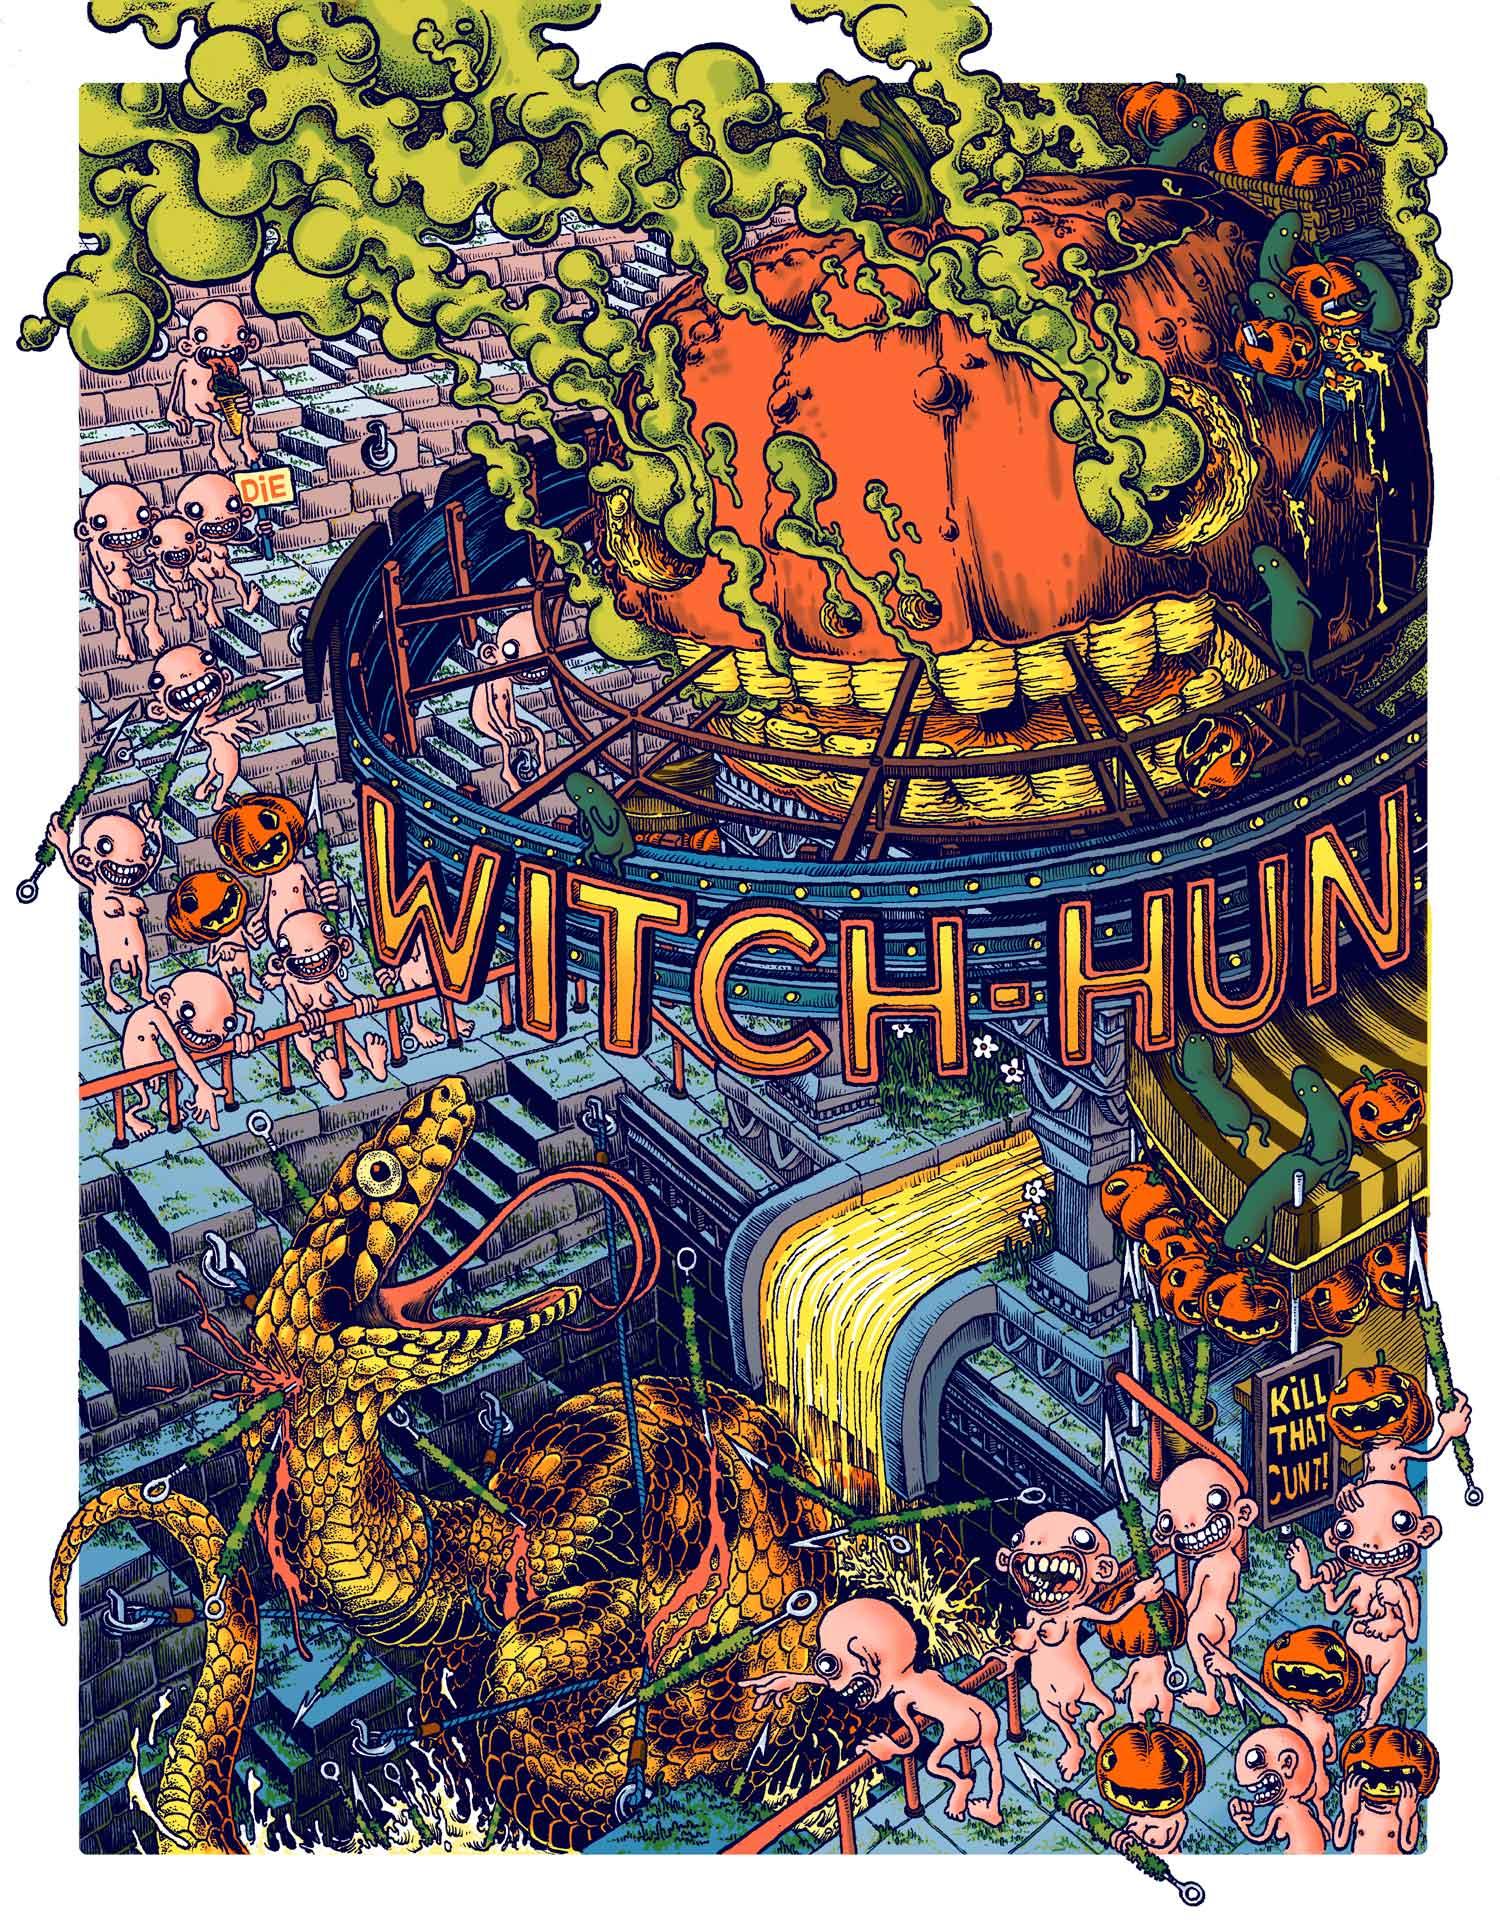 Witchhunt-Snake.jpg